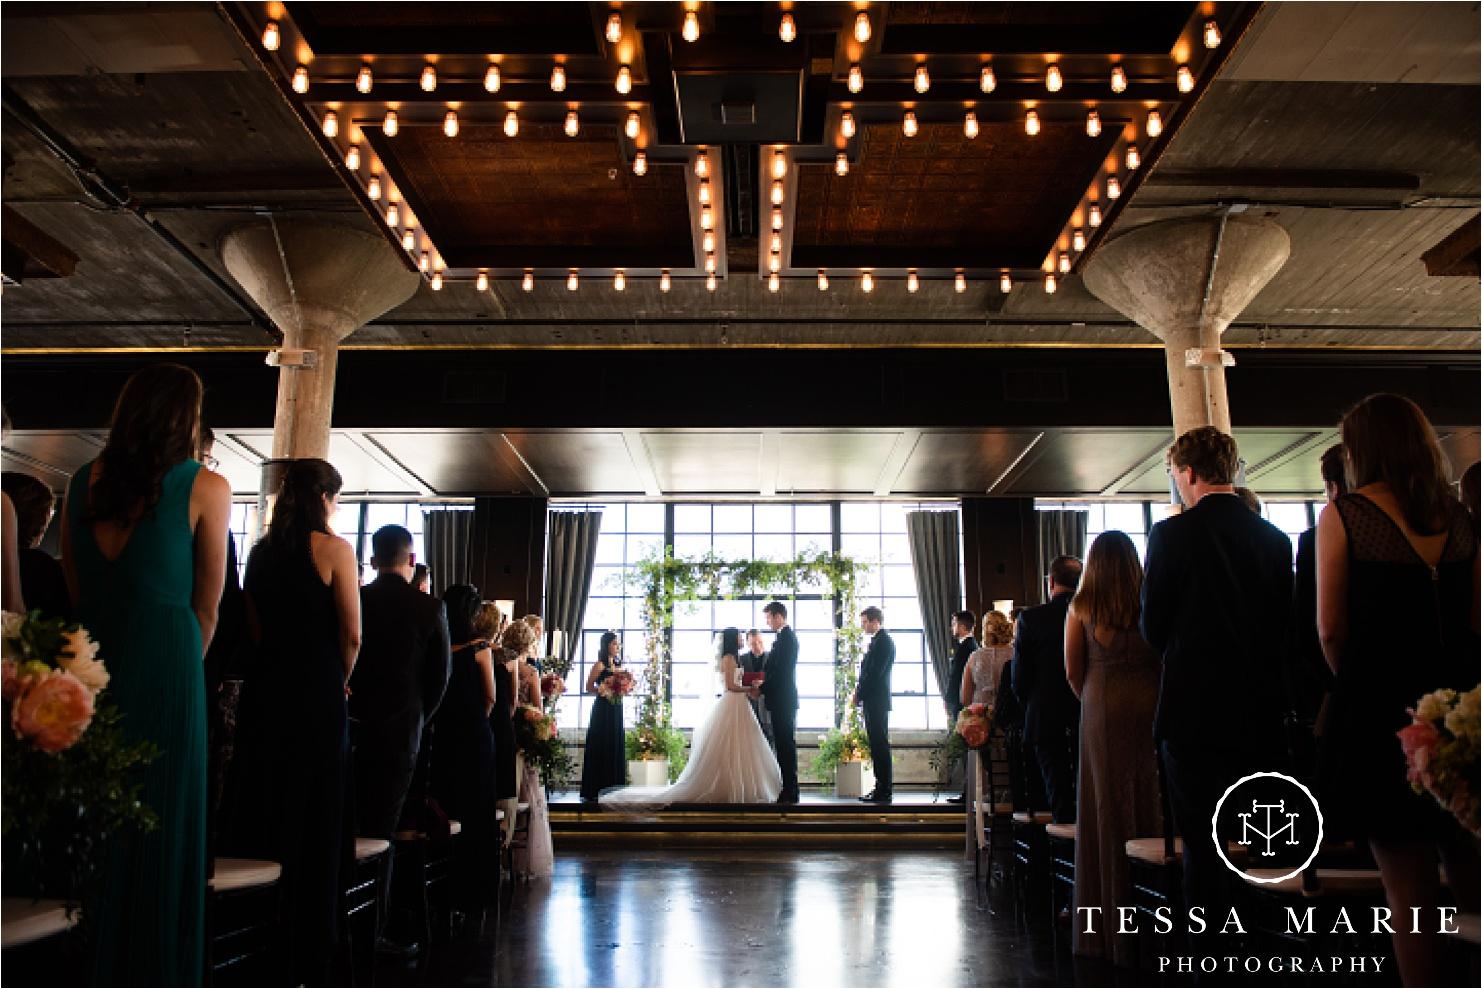 Tessa_marie_weddings_houston_wedding_photographer_The_astorian_0121.jpg